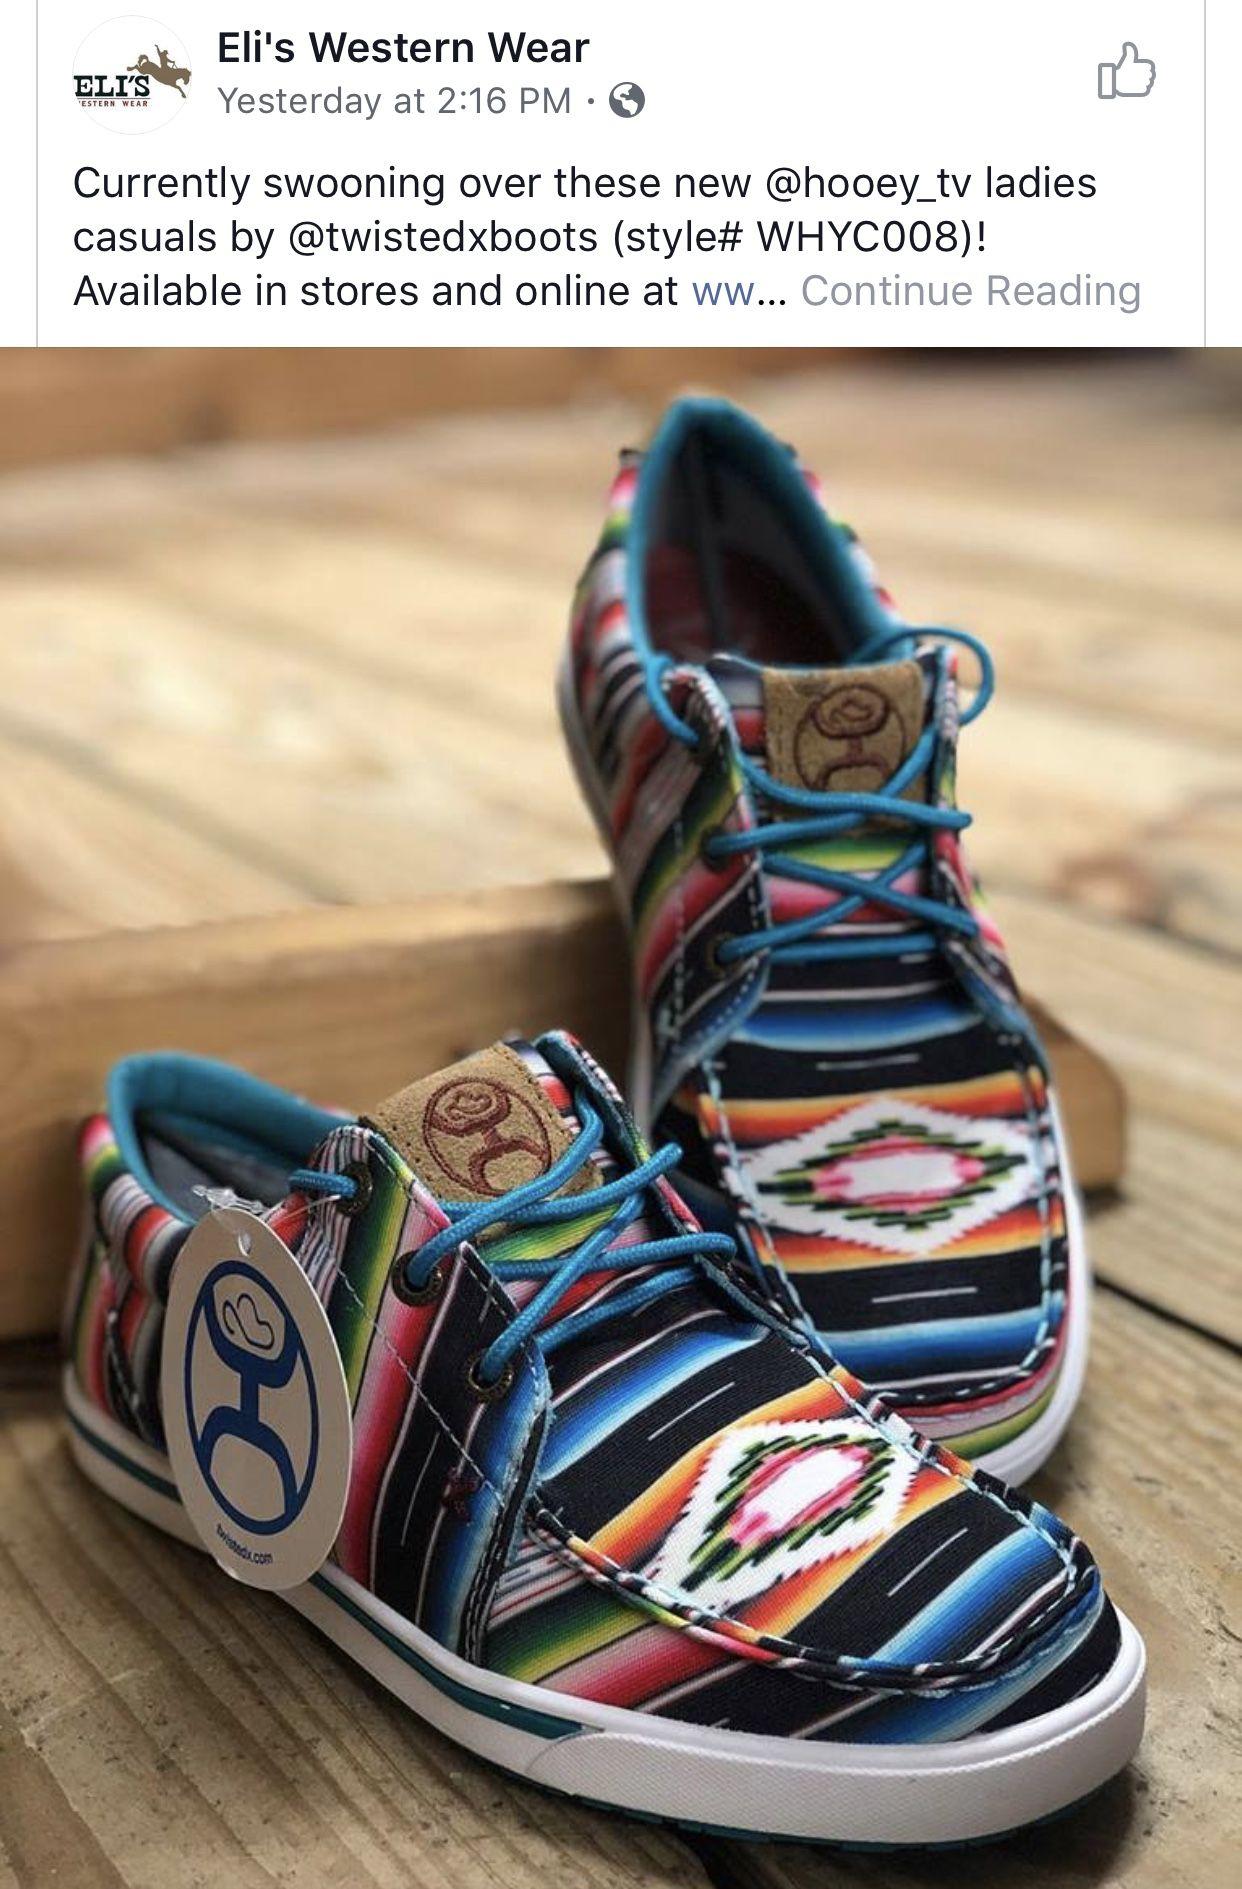 Pin by breener on Fav Look in 2019 | Western shoes, Shoe